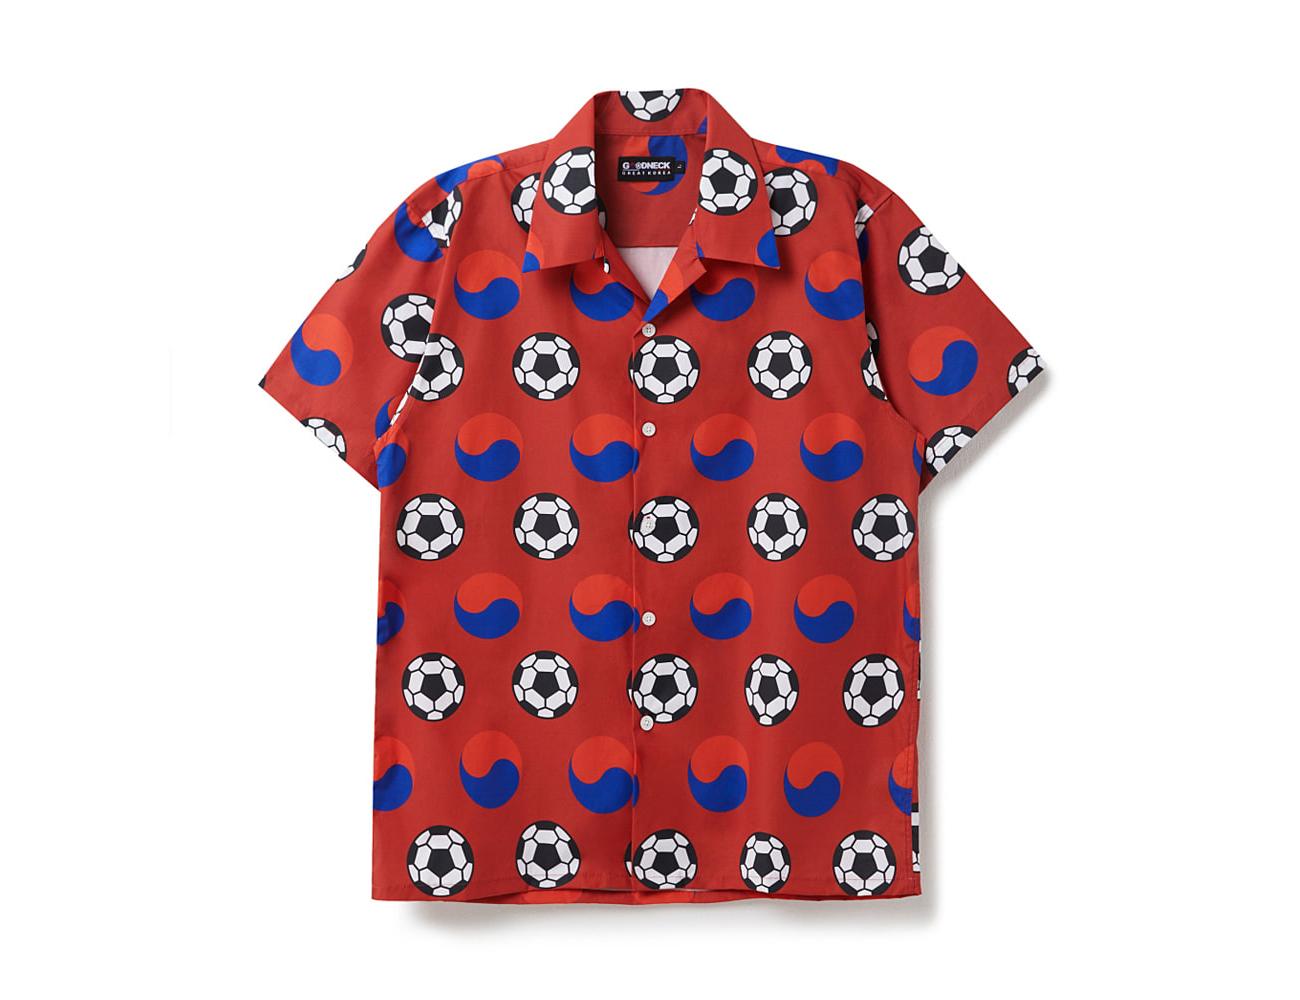 goodtimesbadtimes-korea-shirt-red